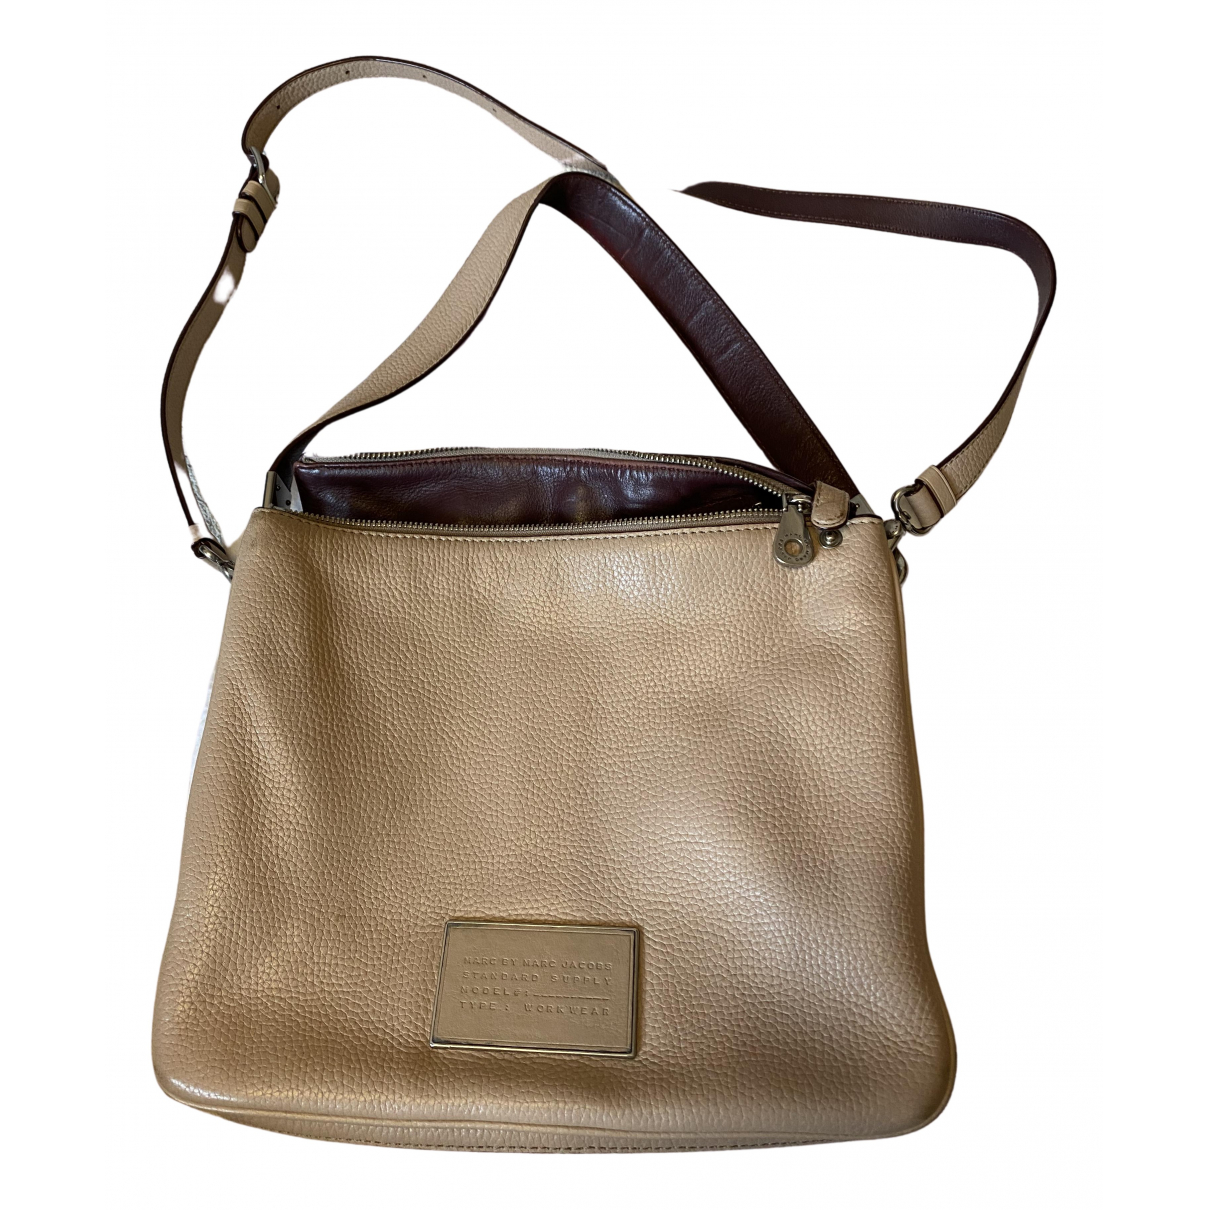 Marc By Marc Jacobs N Beige Leather handbag for Women N